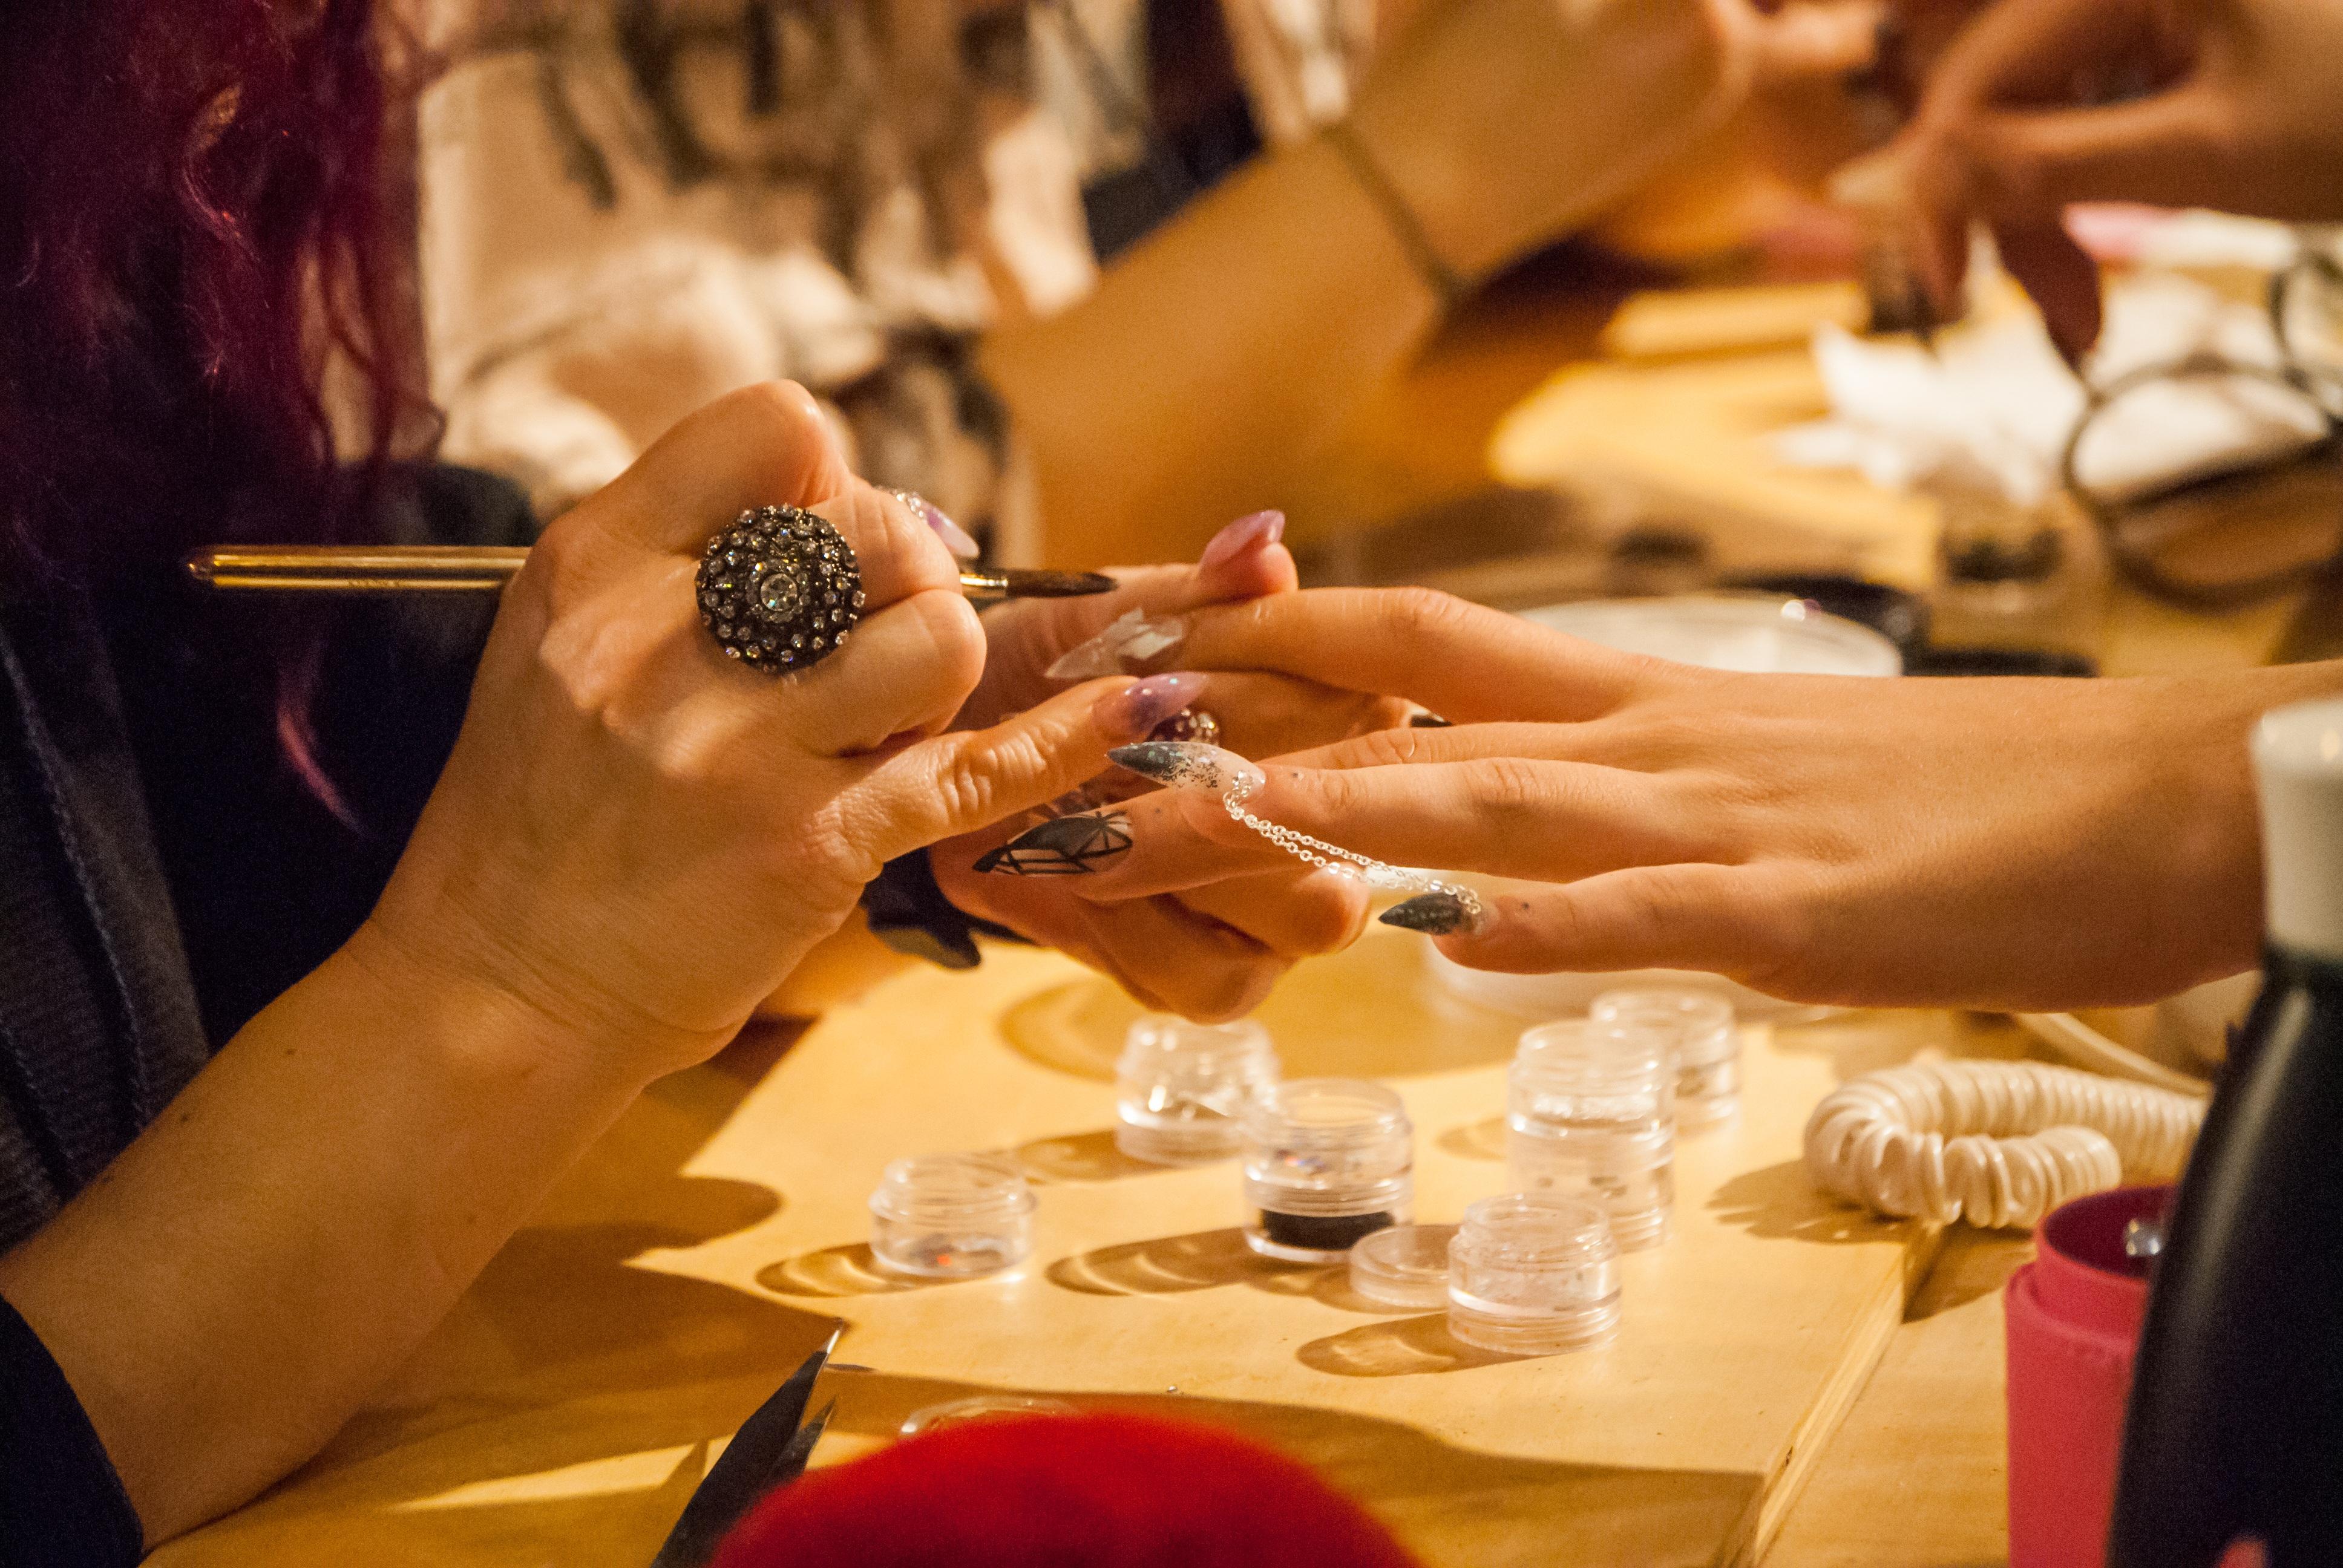 Fotos gratis : mano, hombre, restaurante, modelo, comida, manicura ...